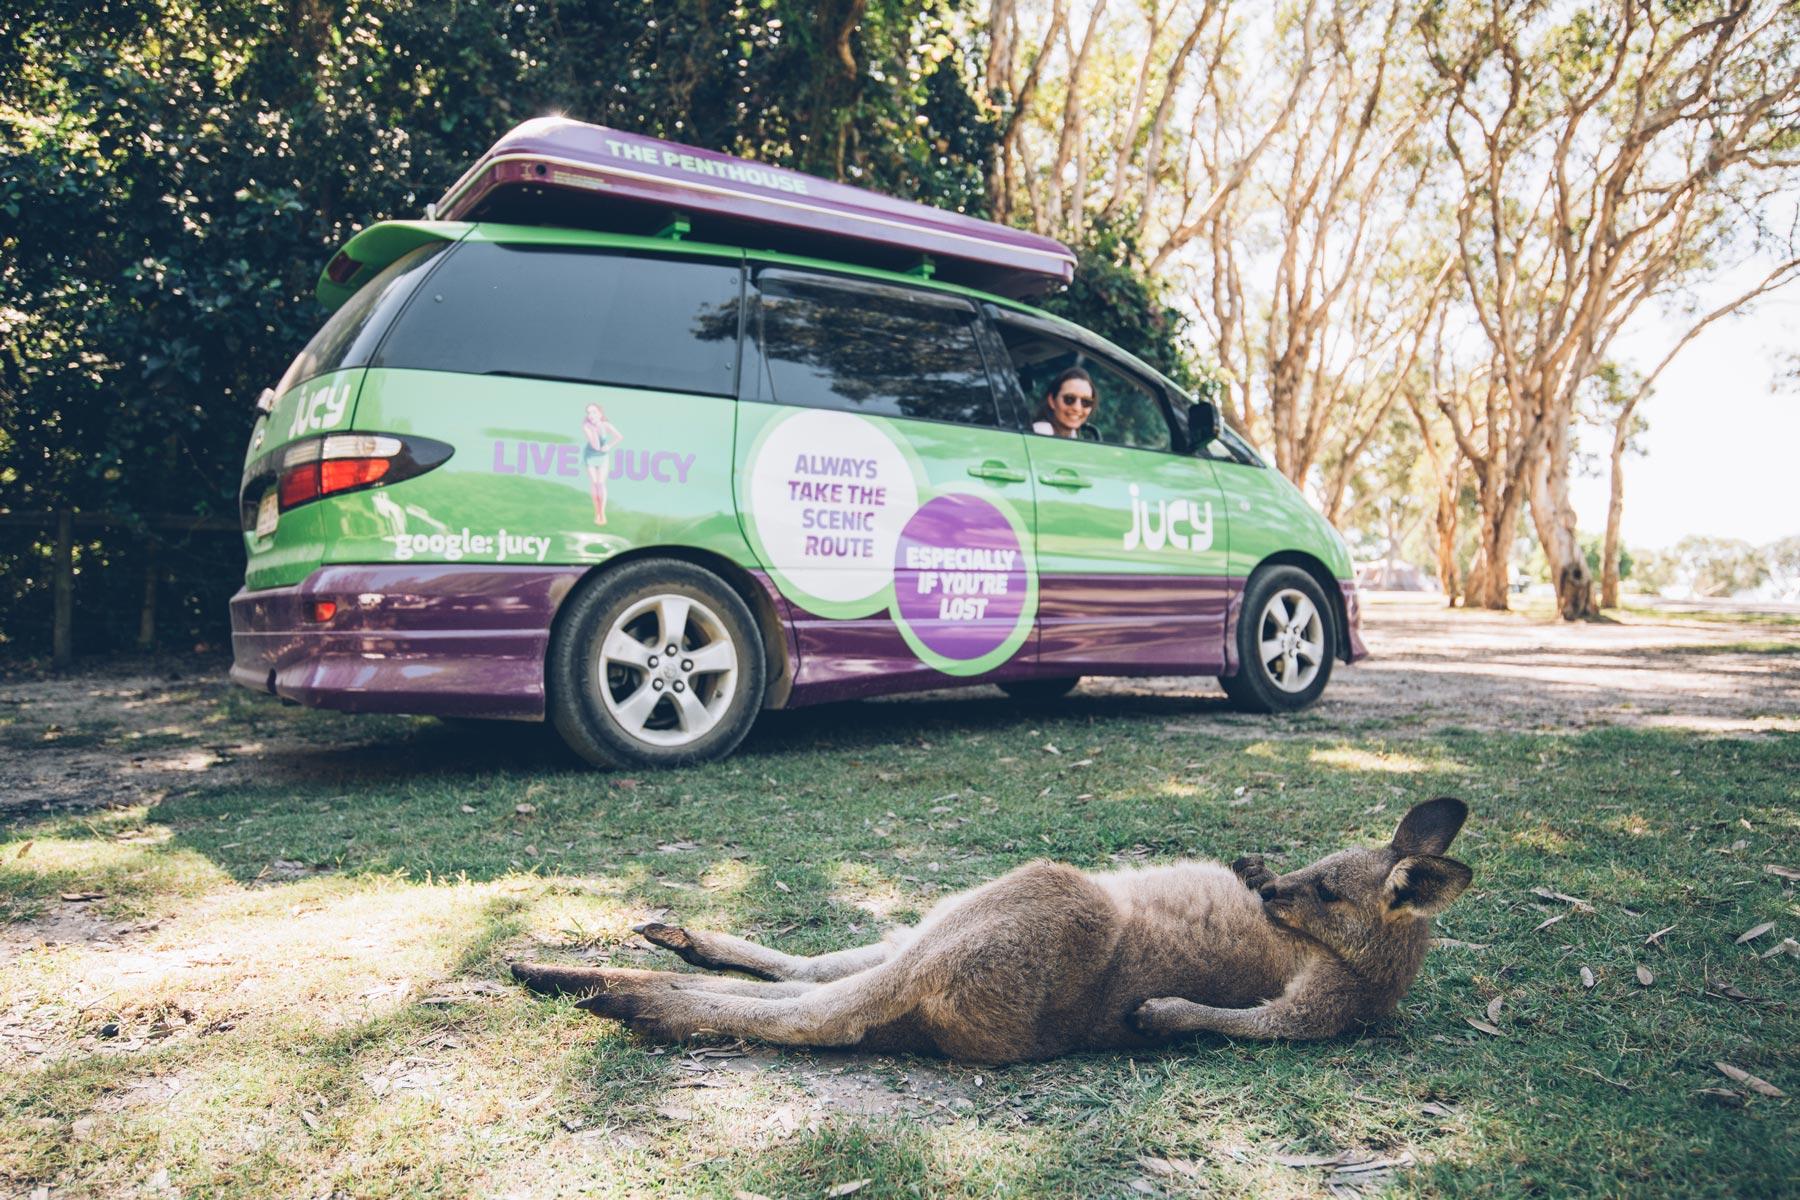 Kangourou Crowdy Bay NP, NSW